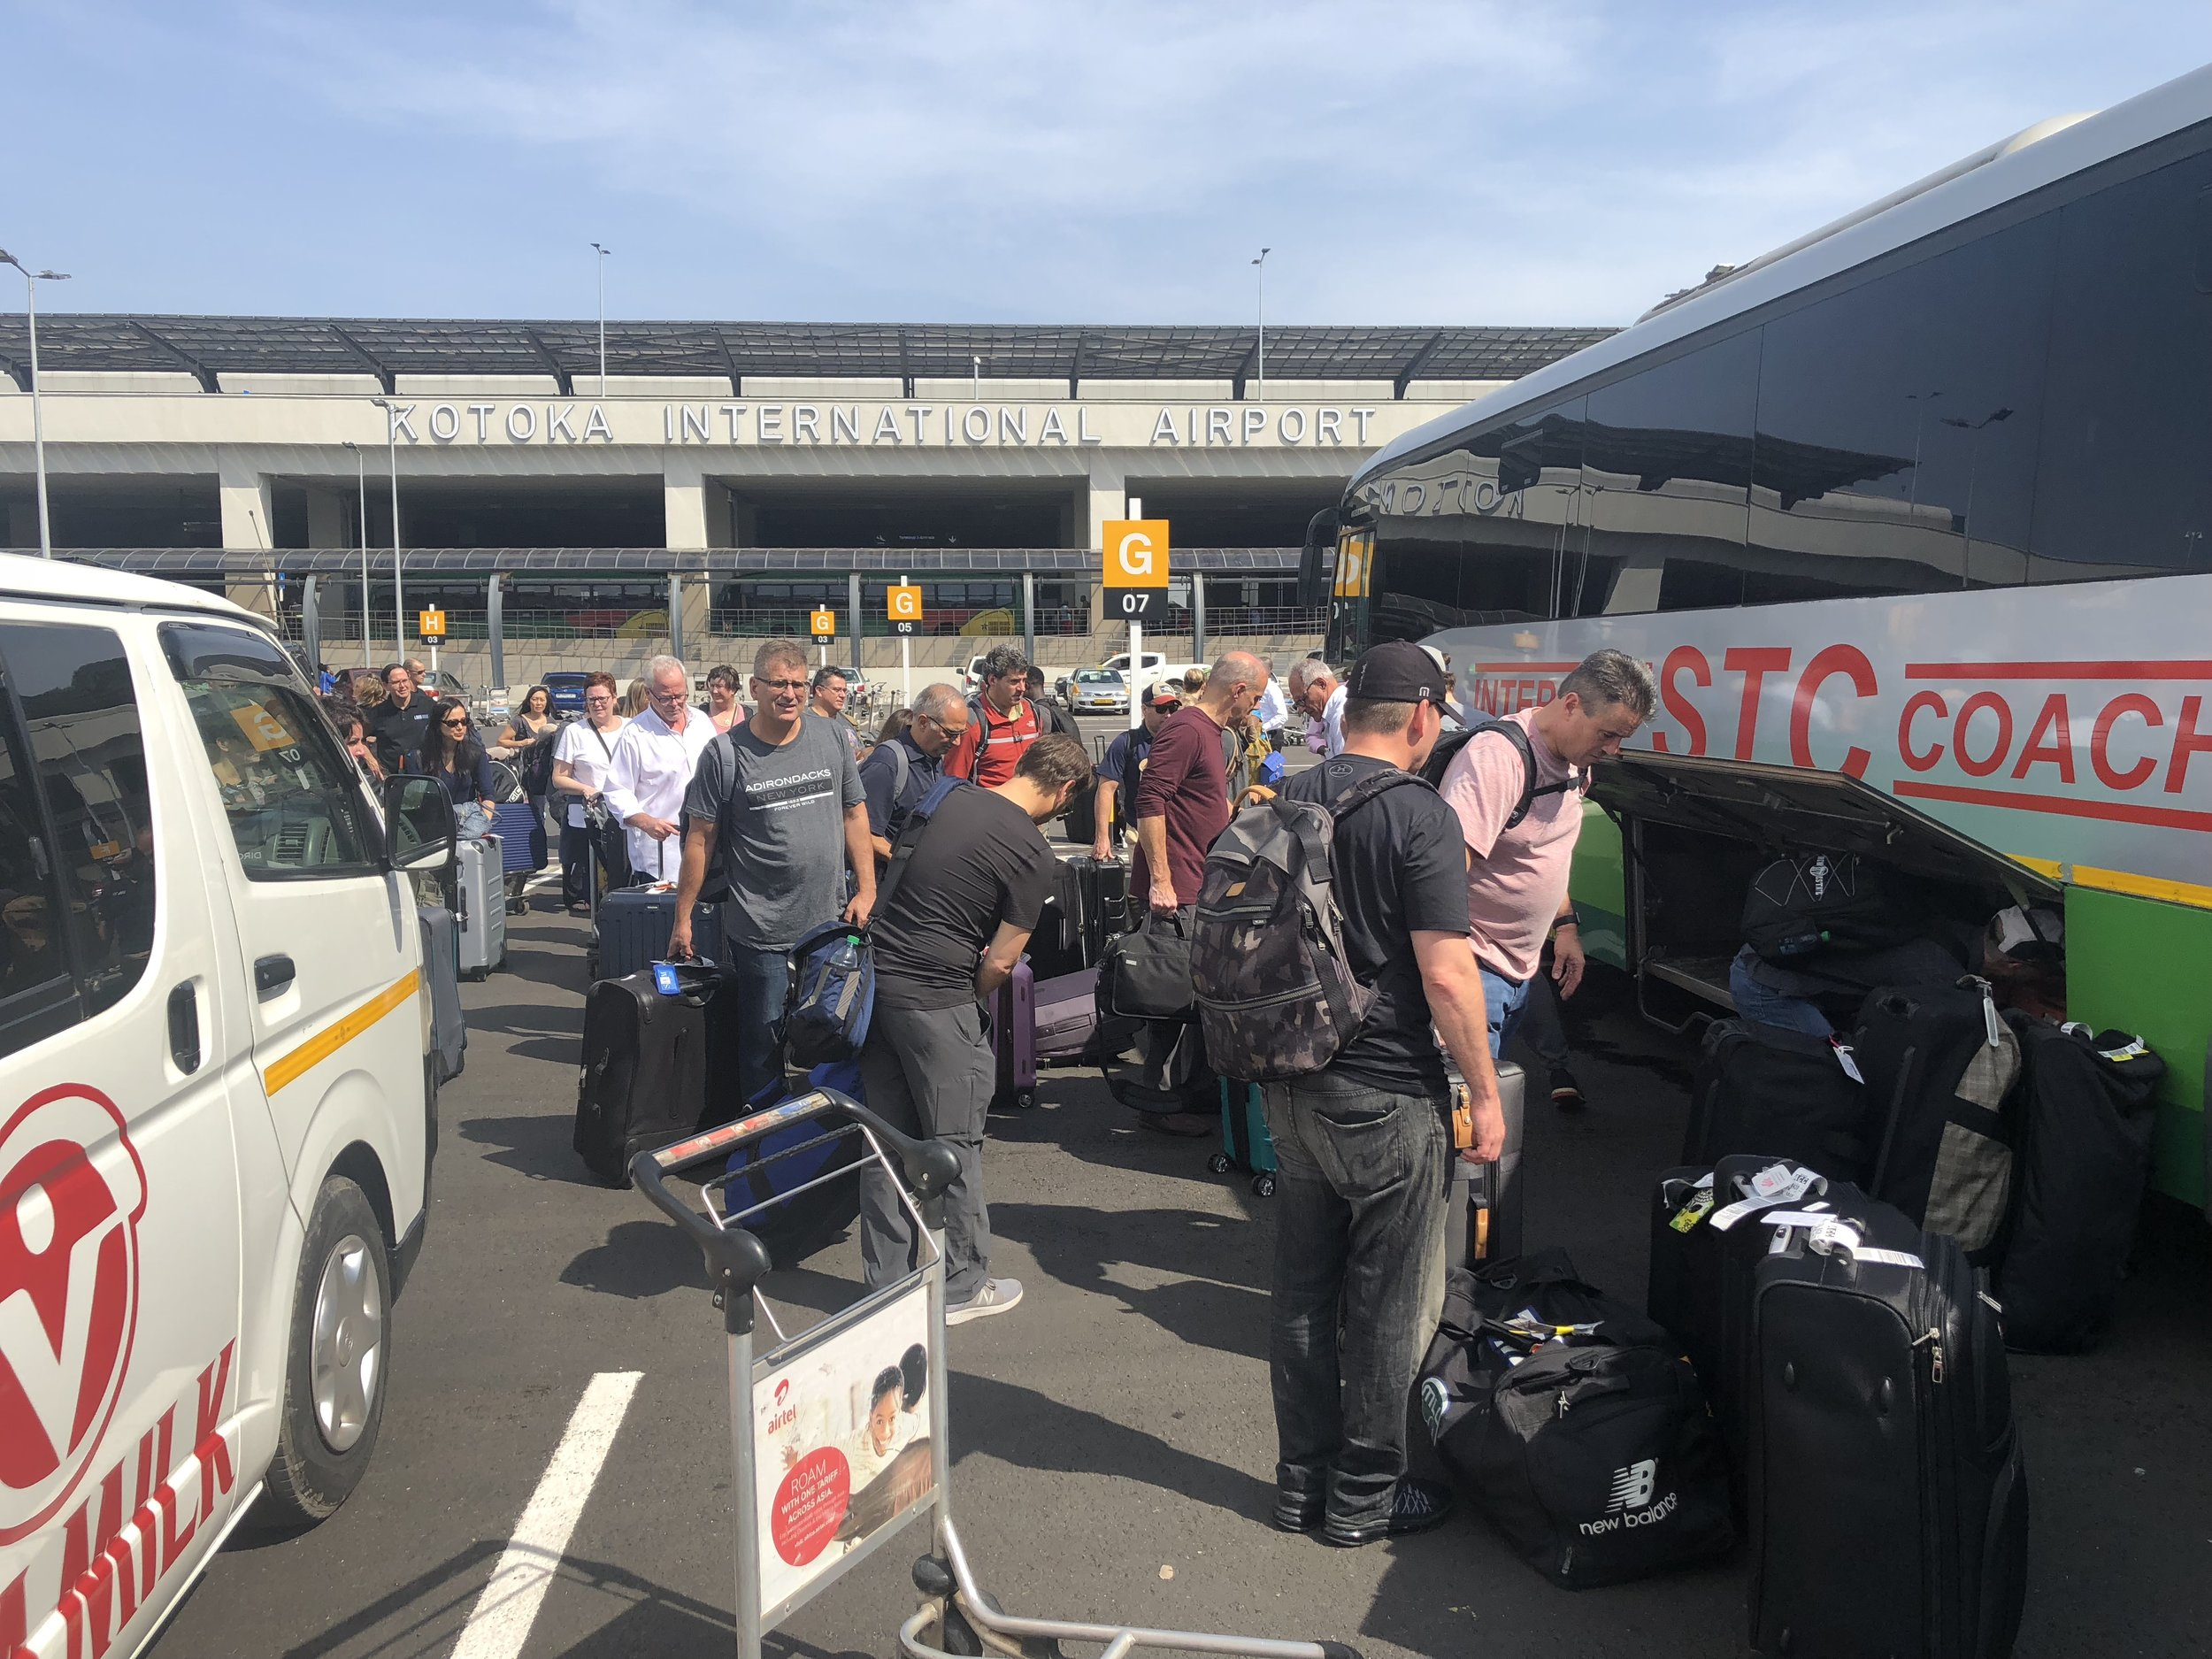 OPERATION WALK 2018 GHANA- BUS ARRIVES WITH TEAM